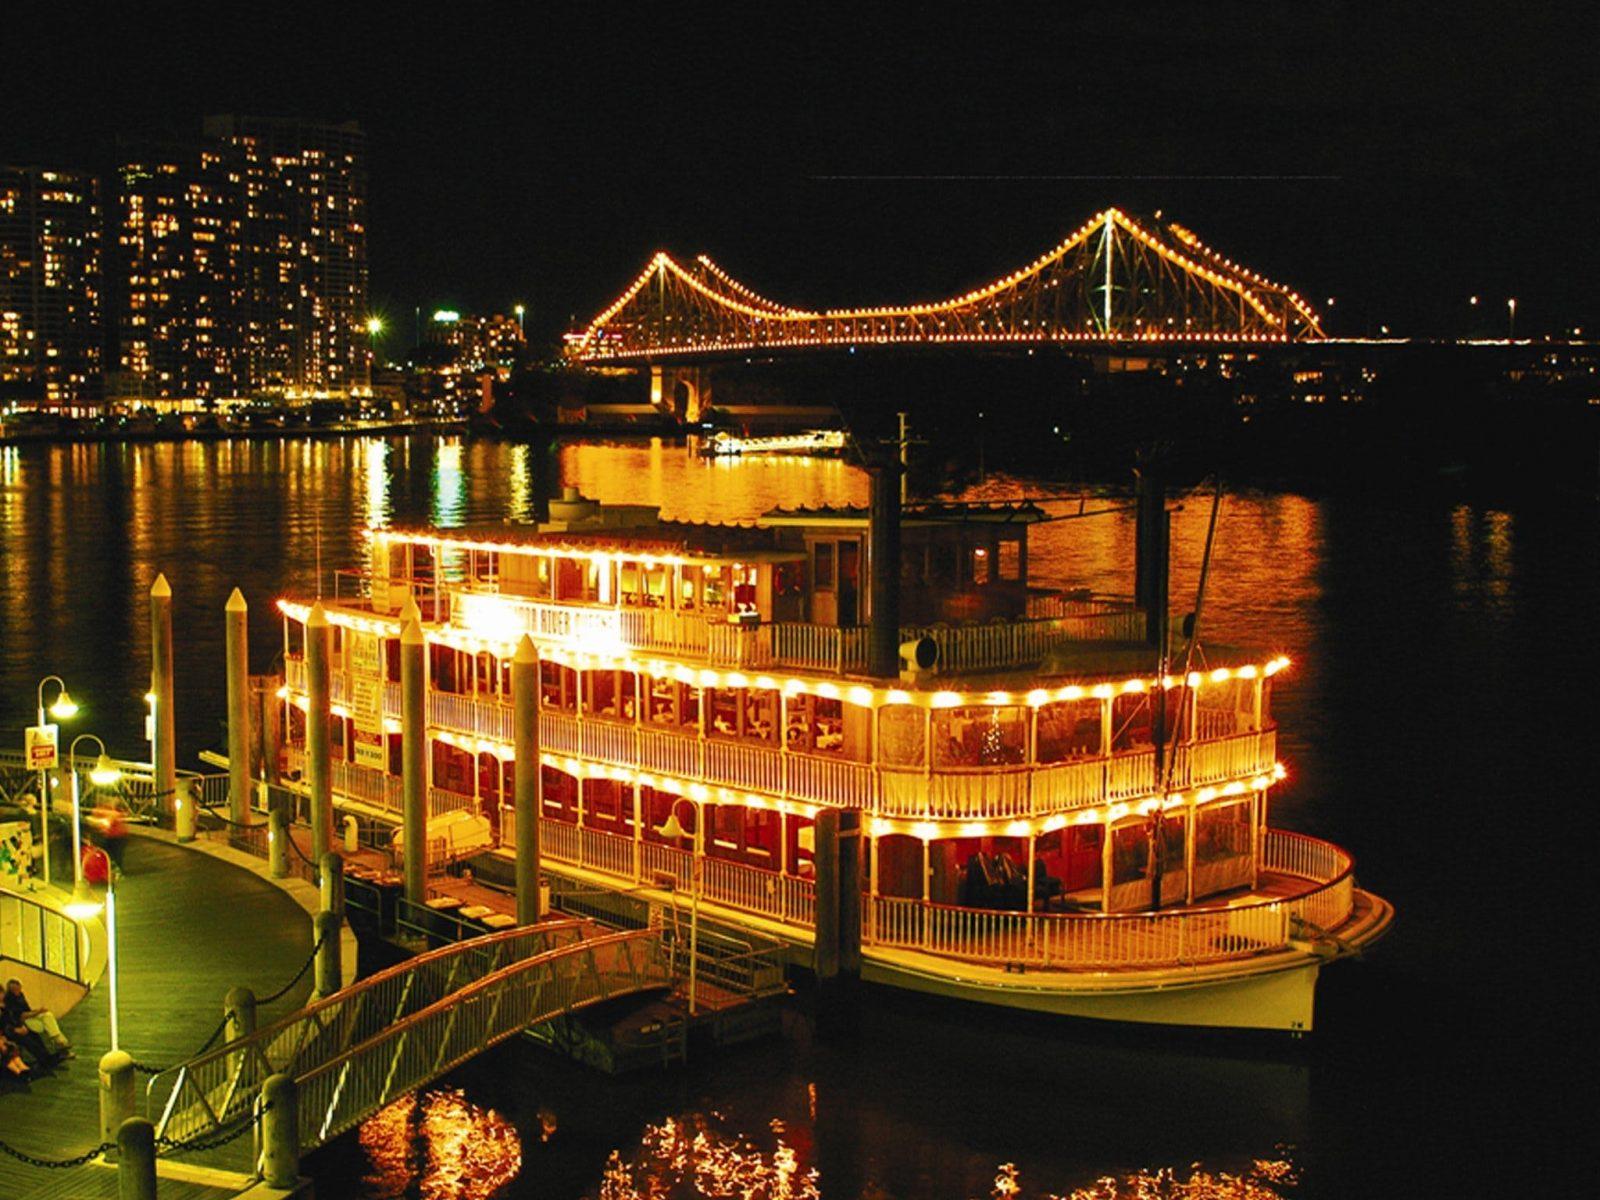 Kookaburra Showboat Cruises